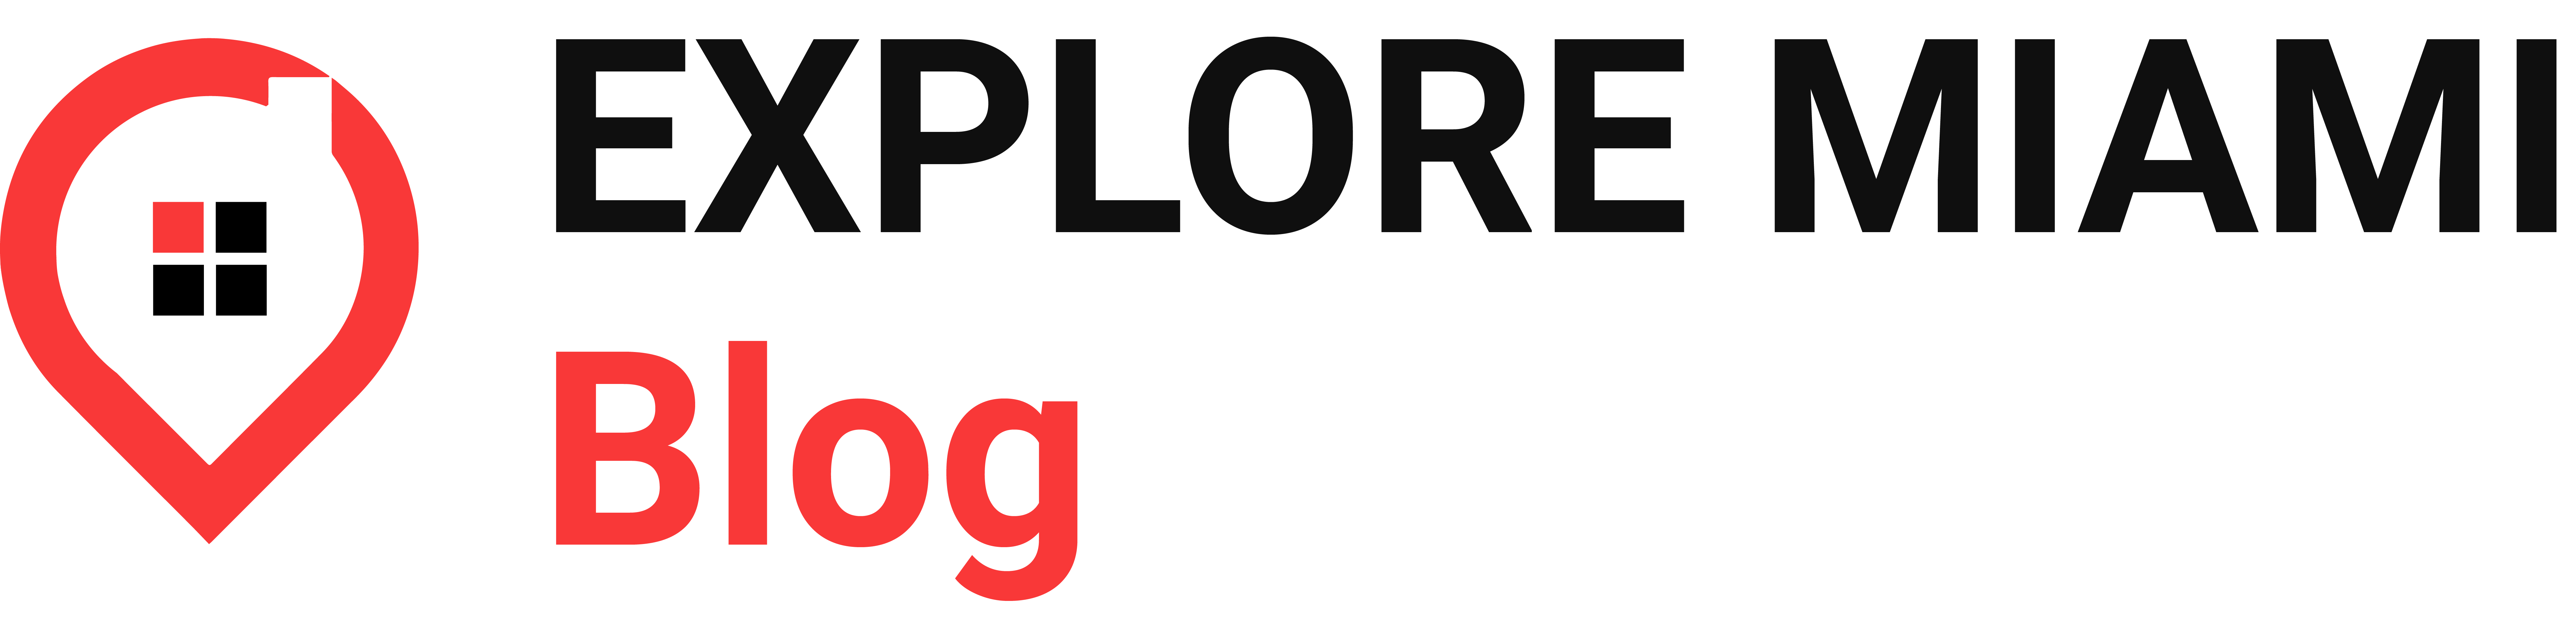 ExploreMiamiBlog logo mobile